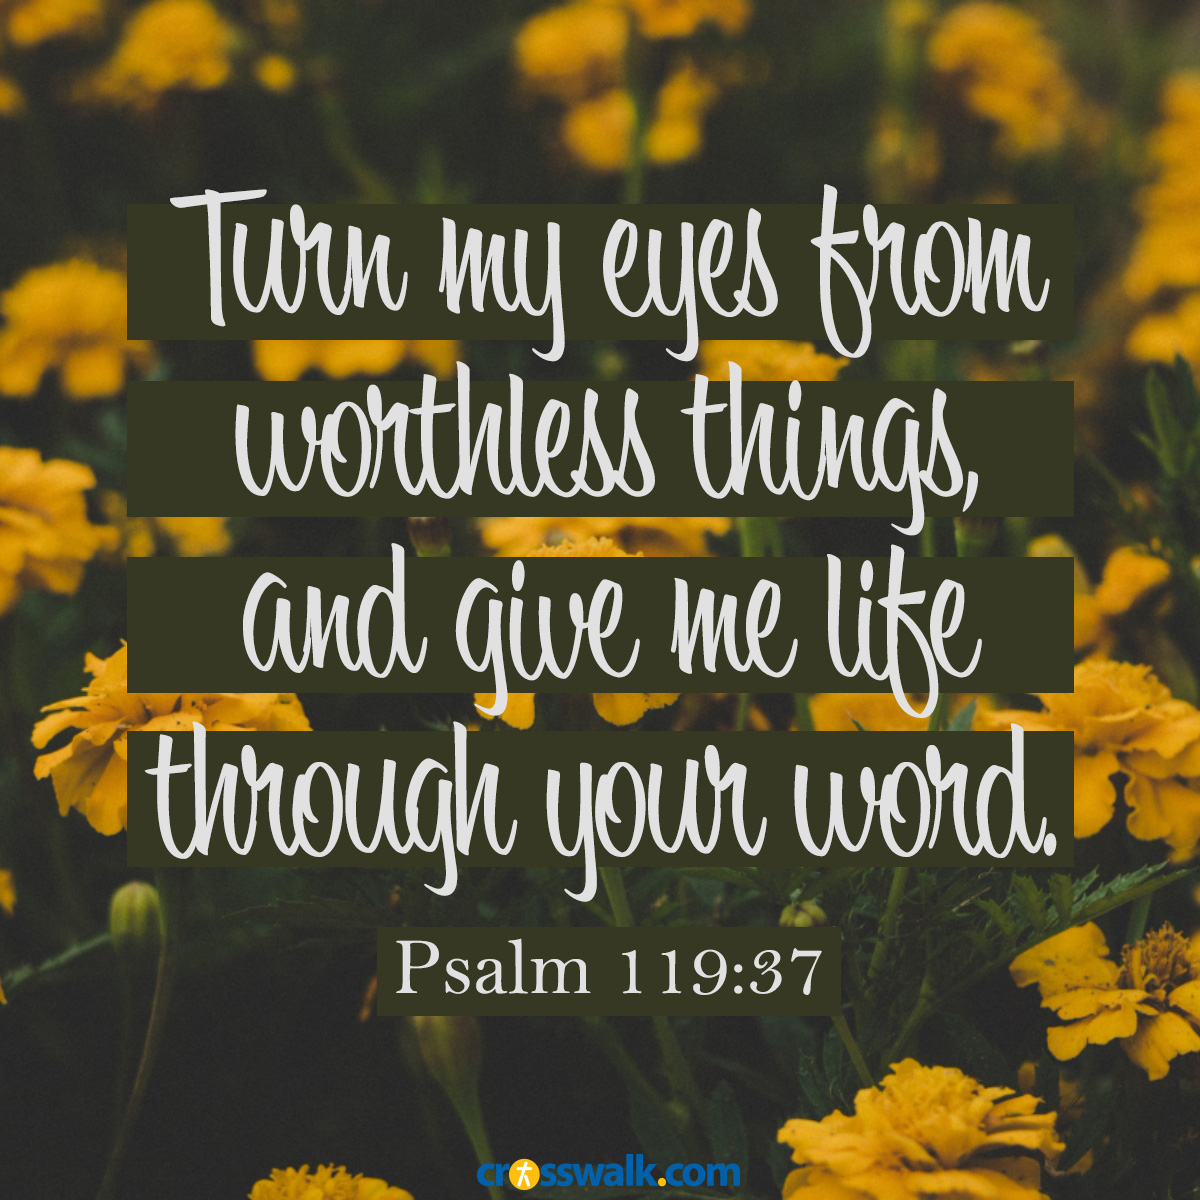 inspirational image of Psalm 119:37